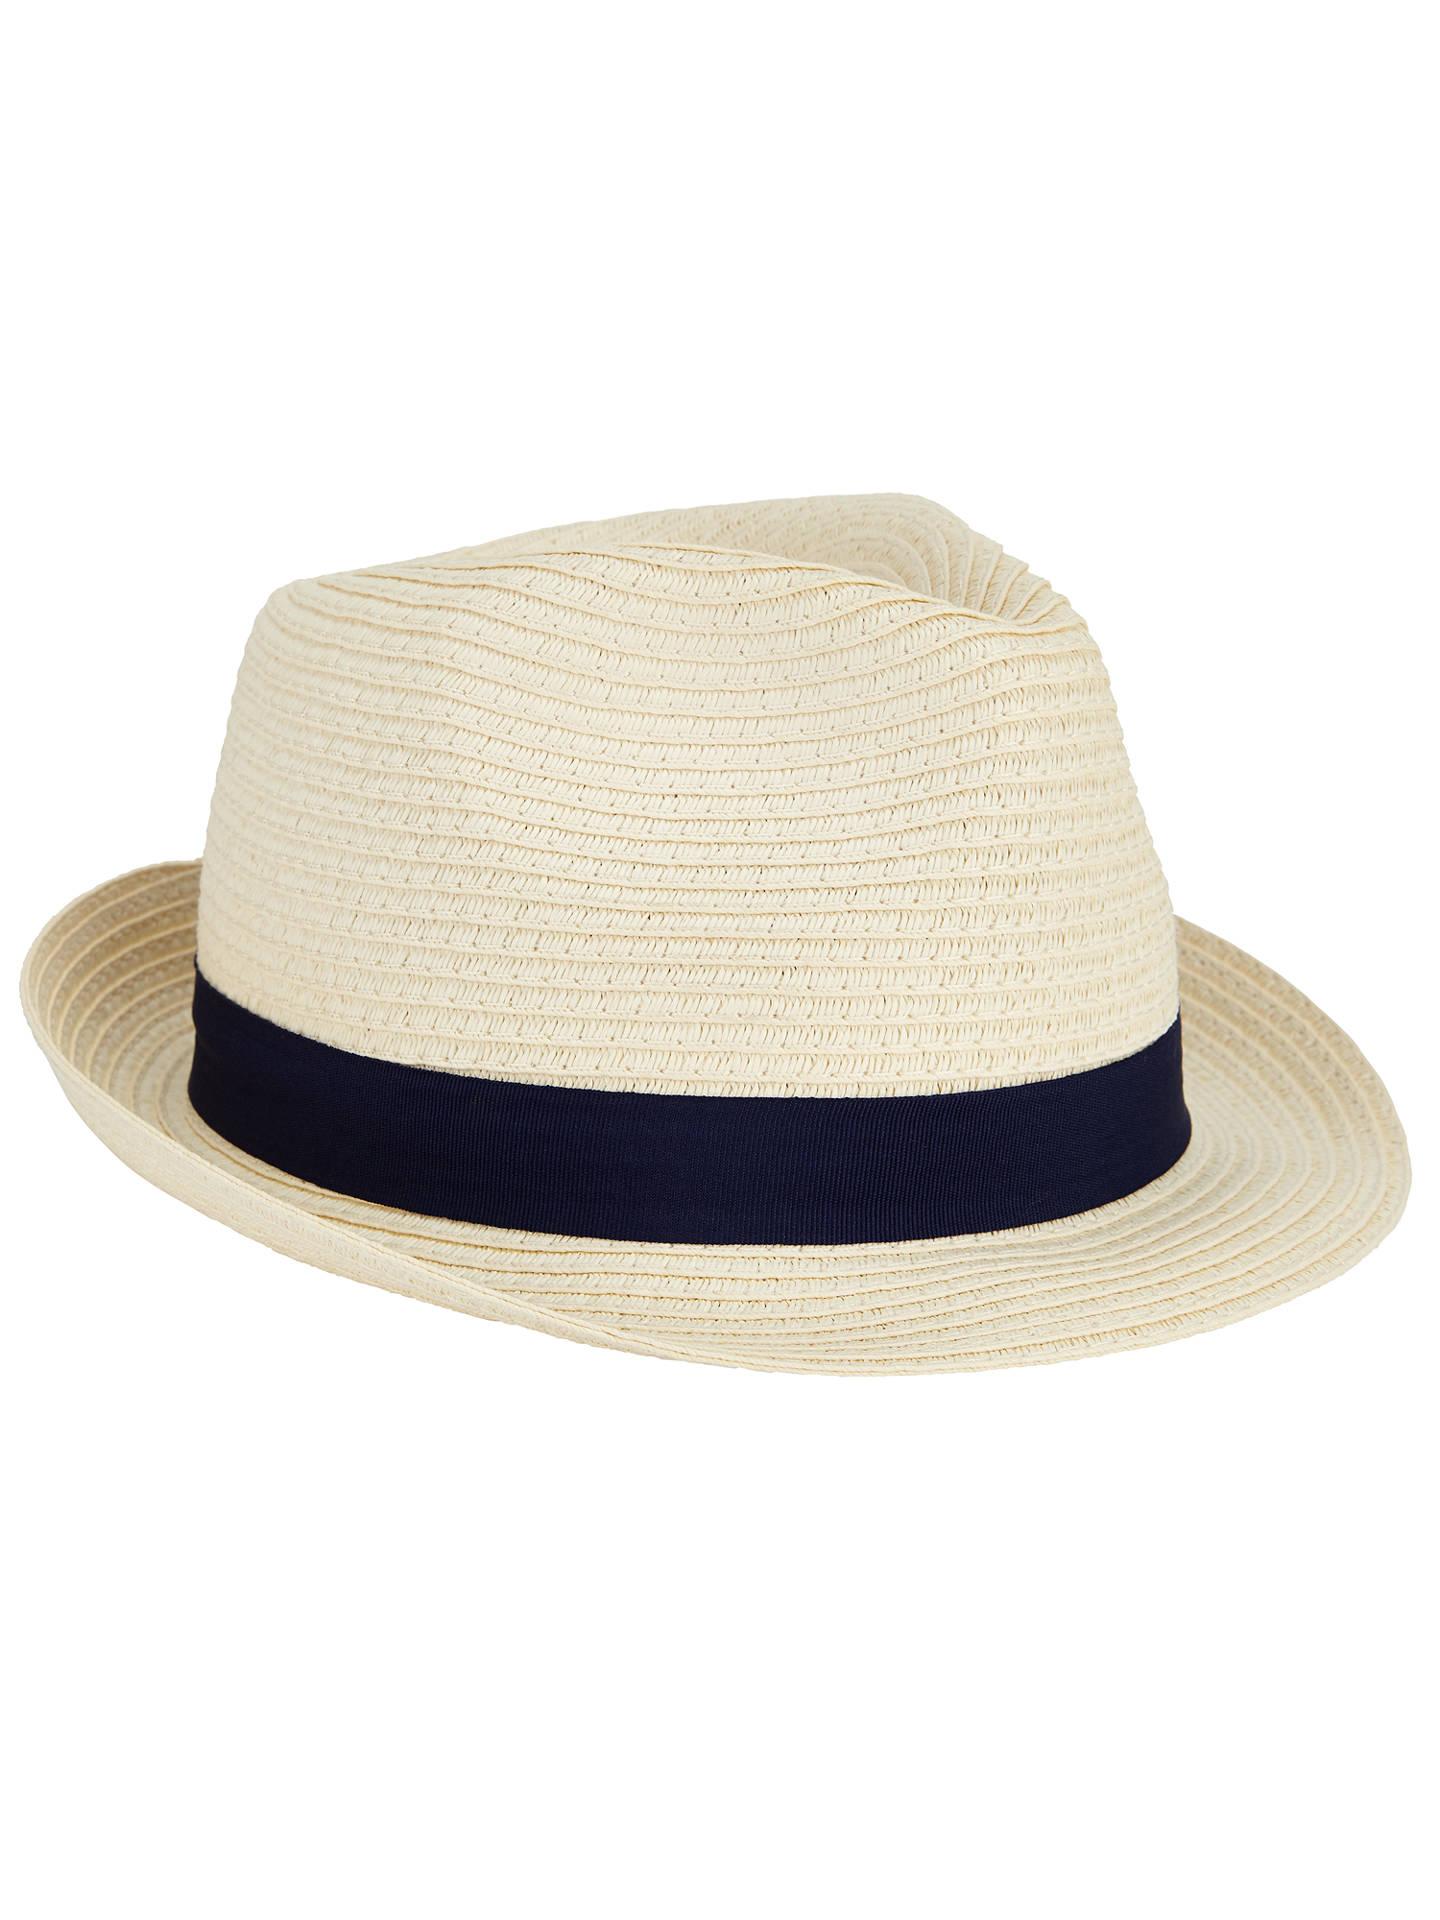 BuyJohn Lewis Packable Braid Ribbon Trilby Hat 24ffb1258934